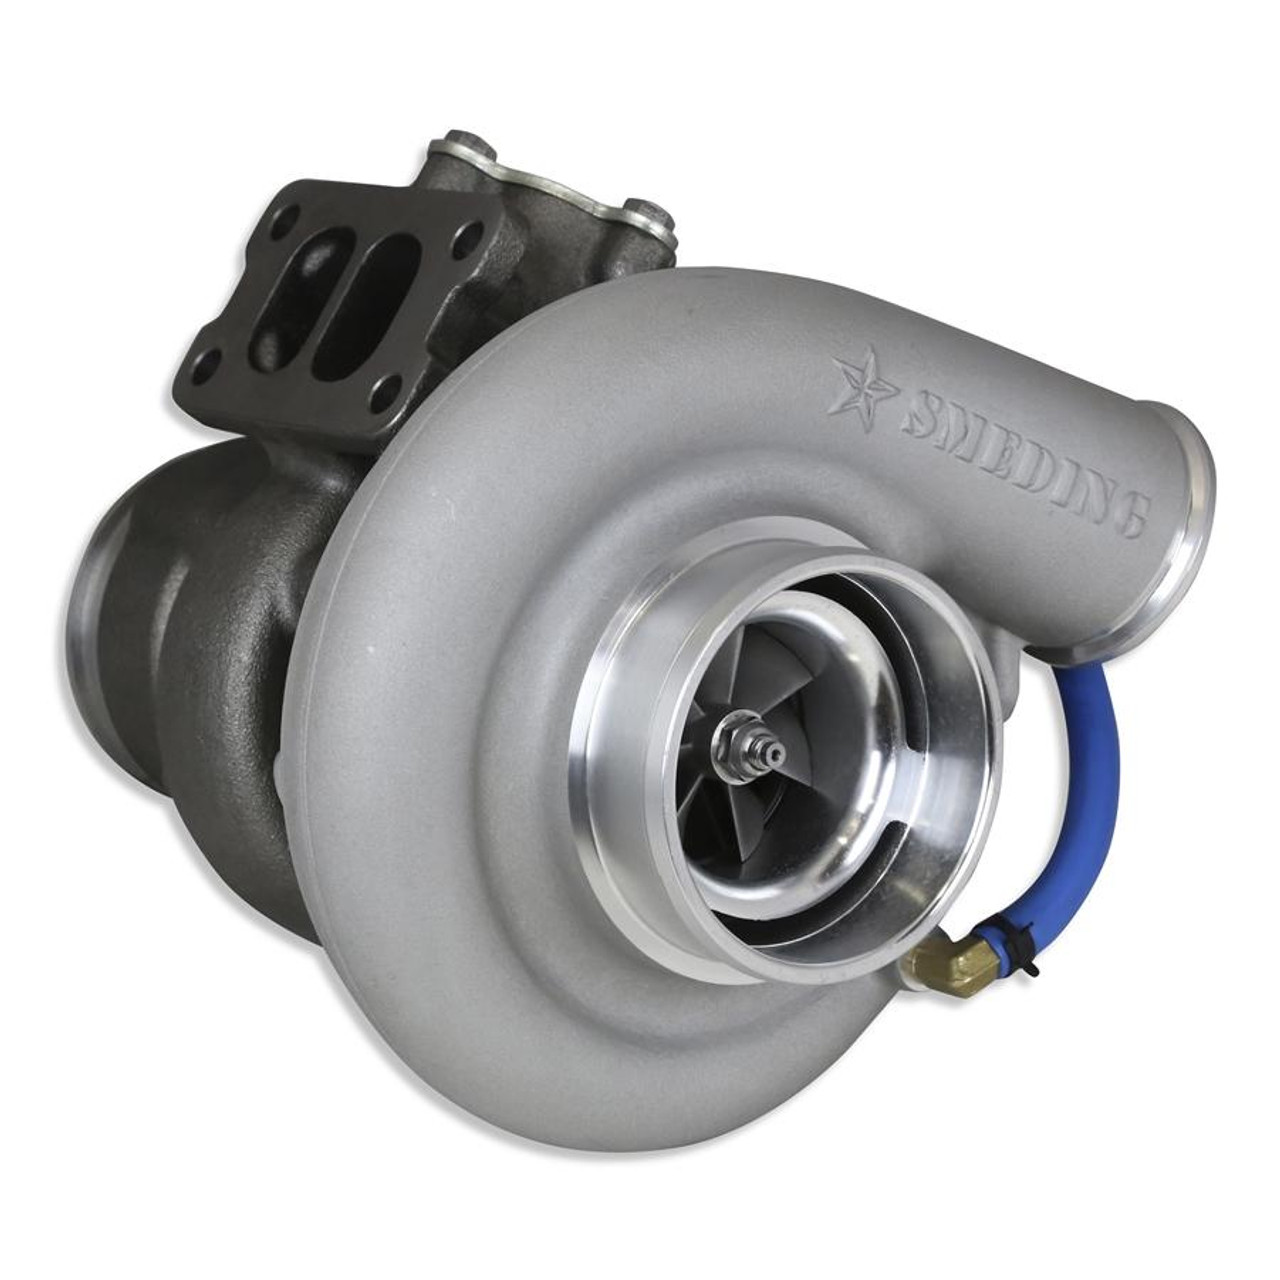 Smeding Diesel S362 Billet Drop in Turbo